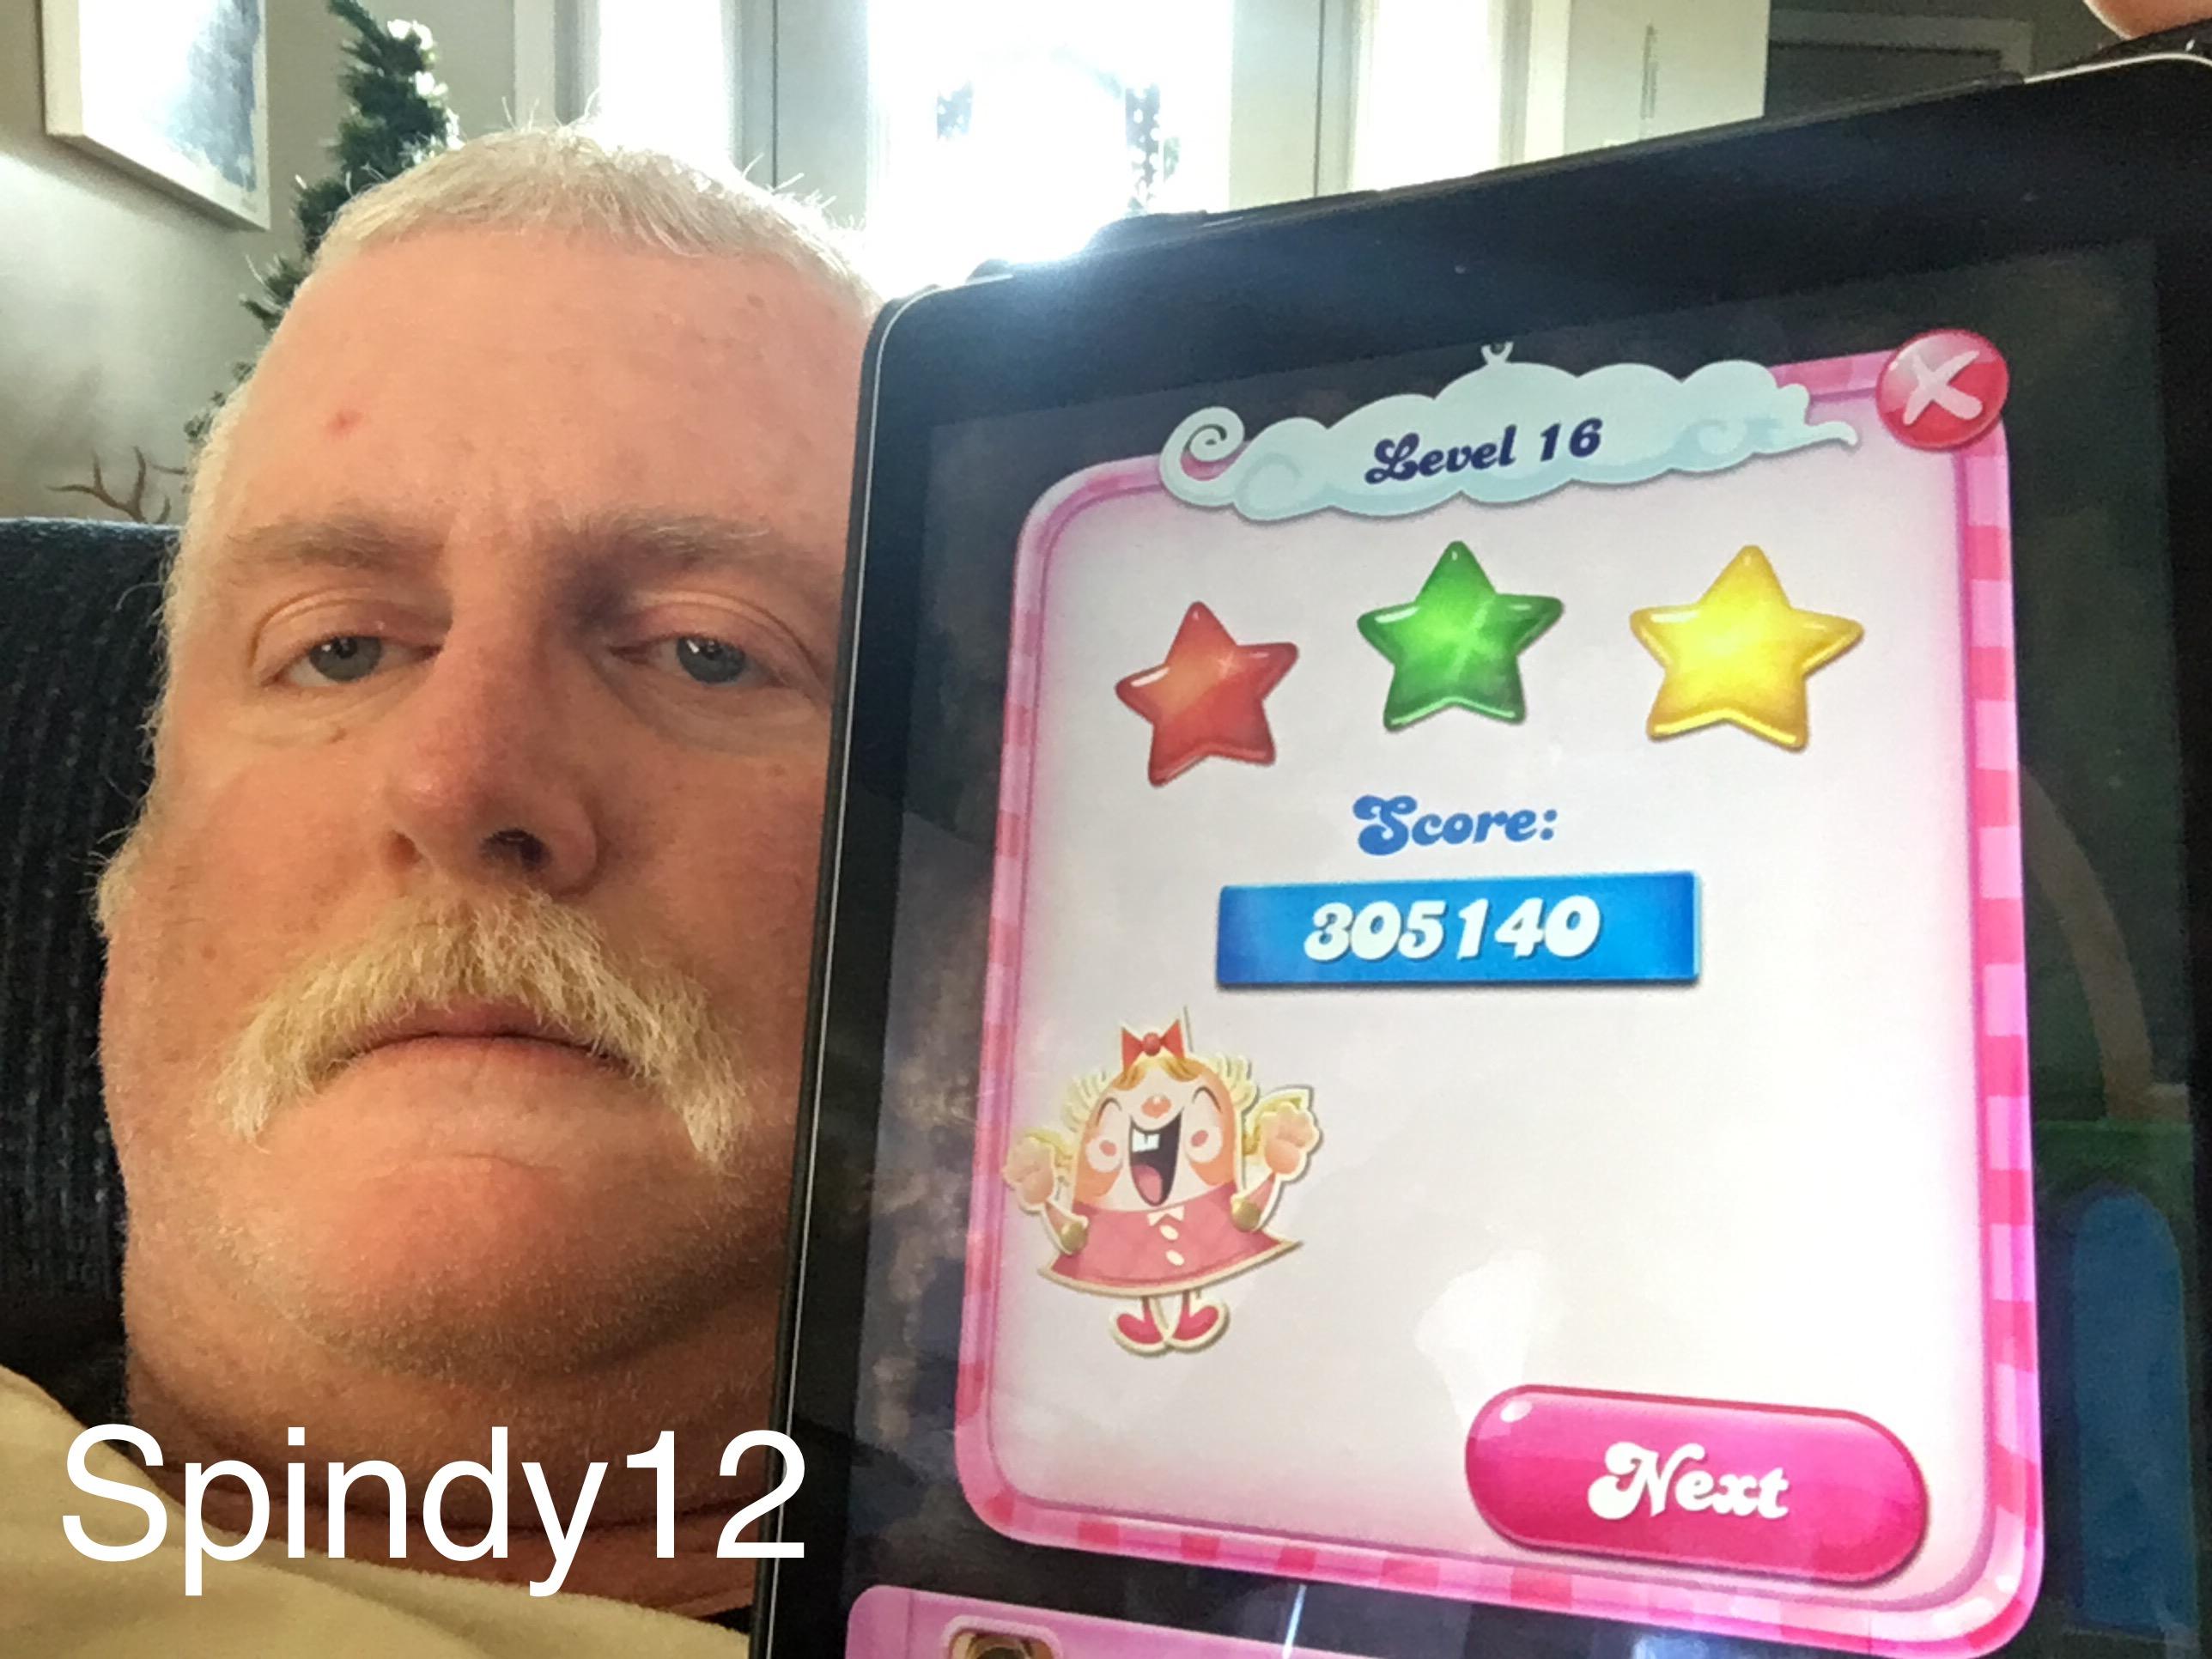 Candy Crush Saga: Level 016 305,140 points